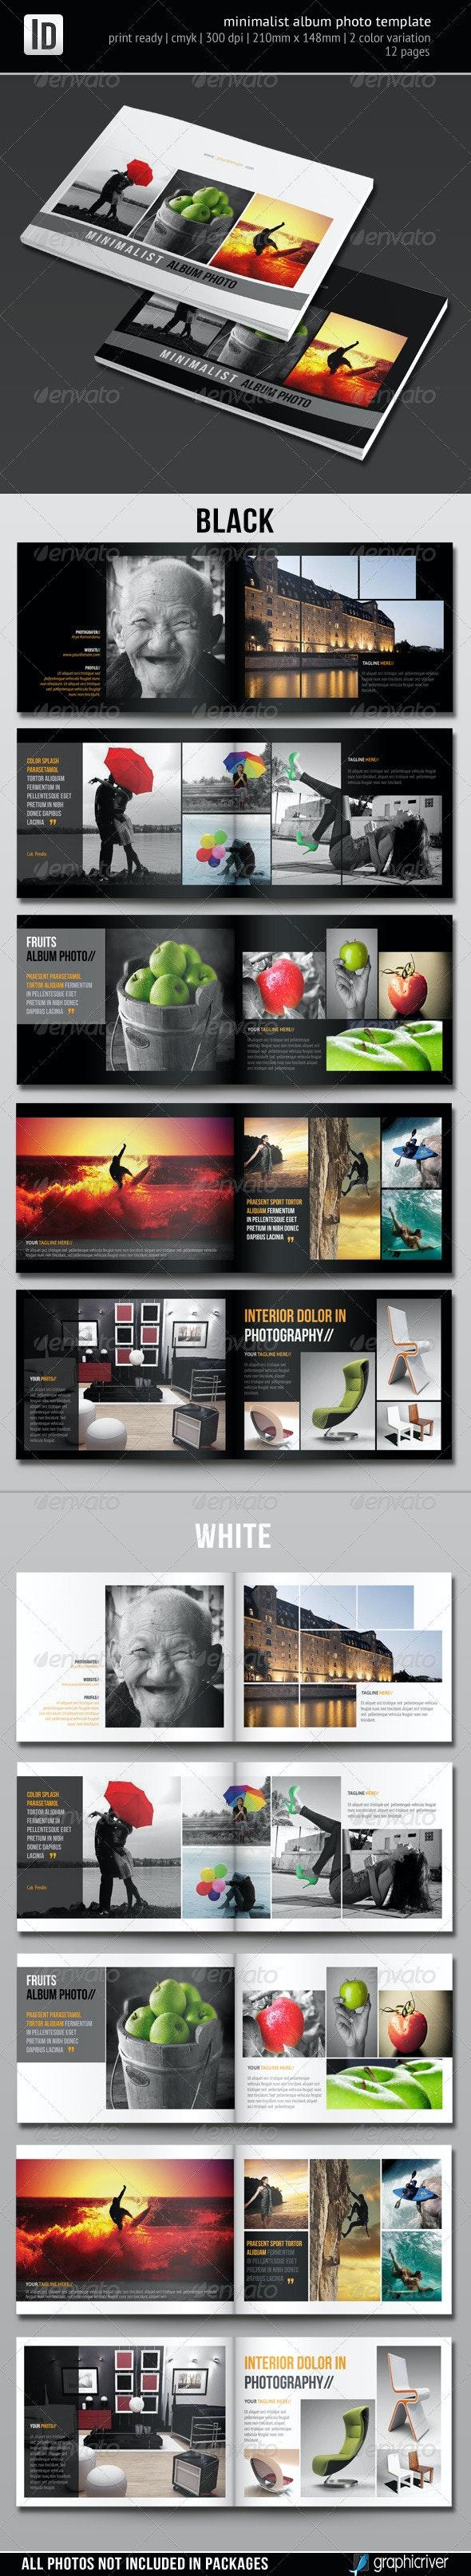 Minimalist Album Photo Template - Photo Albums Print Templates